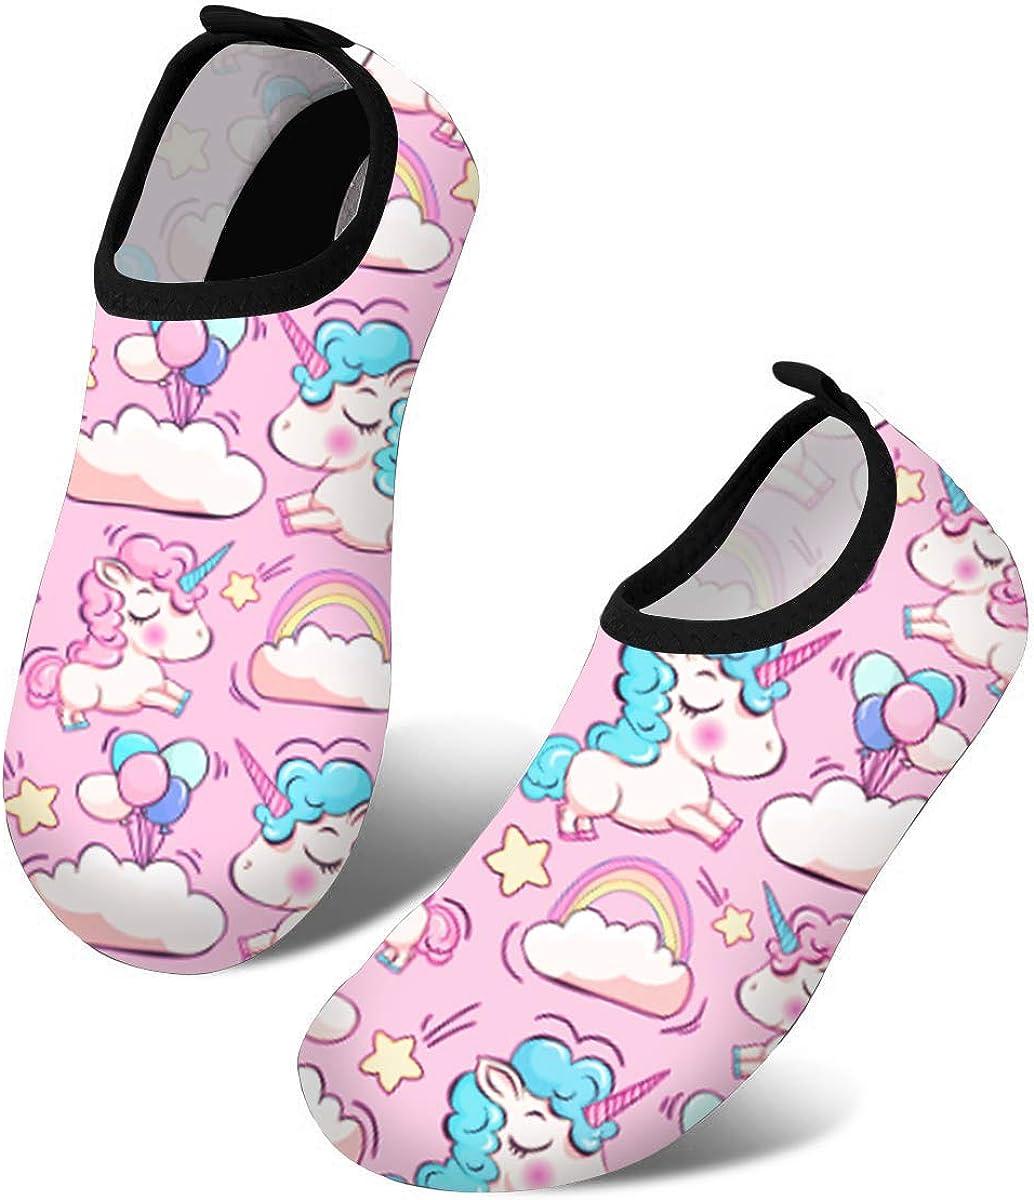 Kids Swim Water Shoes Dry Skin Barefoot Sports Aqua Socks Black Boys Girls 5055